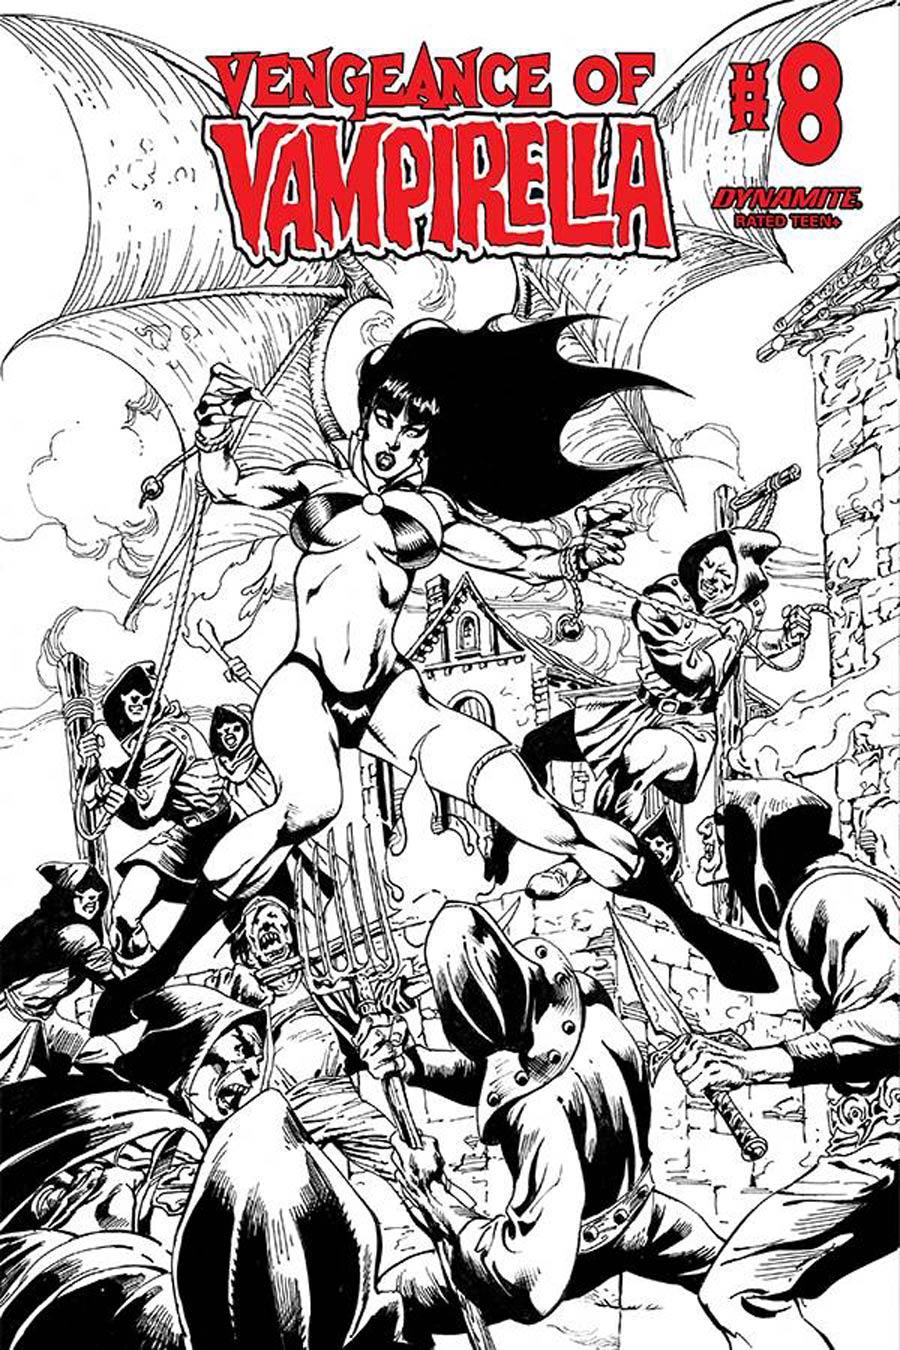 Vengeance Of Vampirella Vol 2 #8 Cover G Variant Roberto Castro Black & White Cover